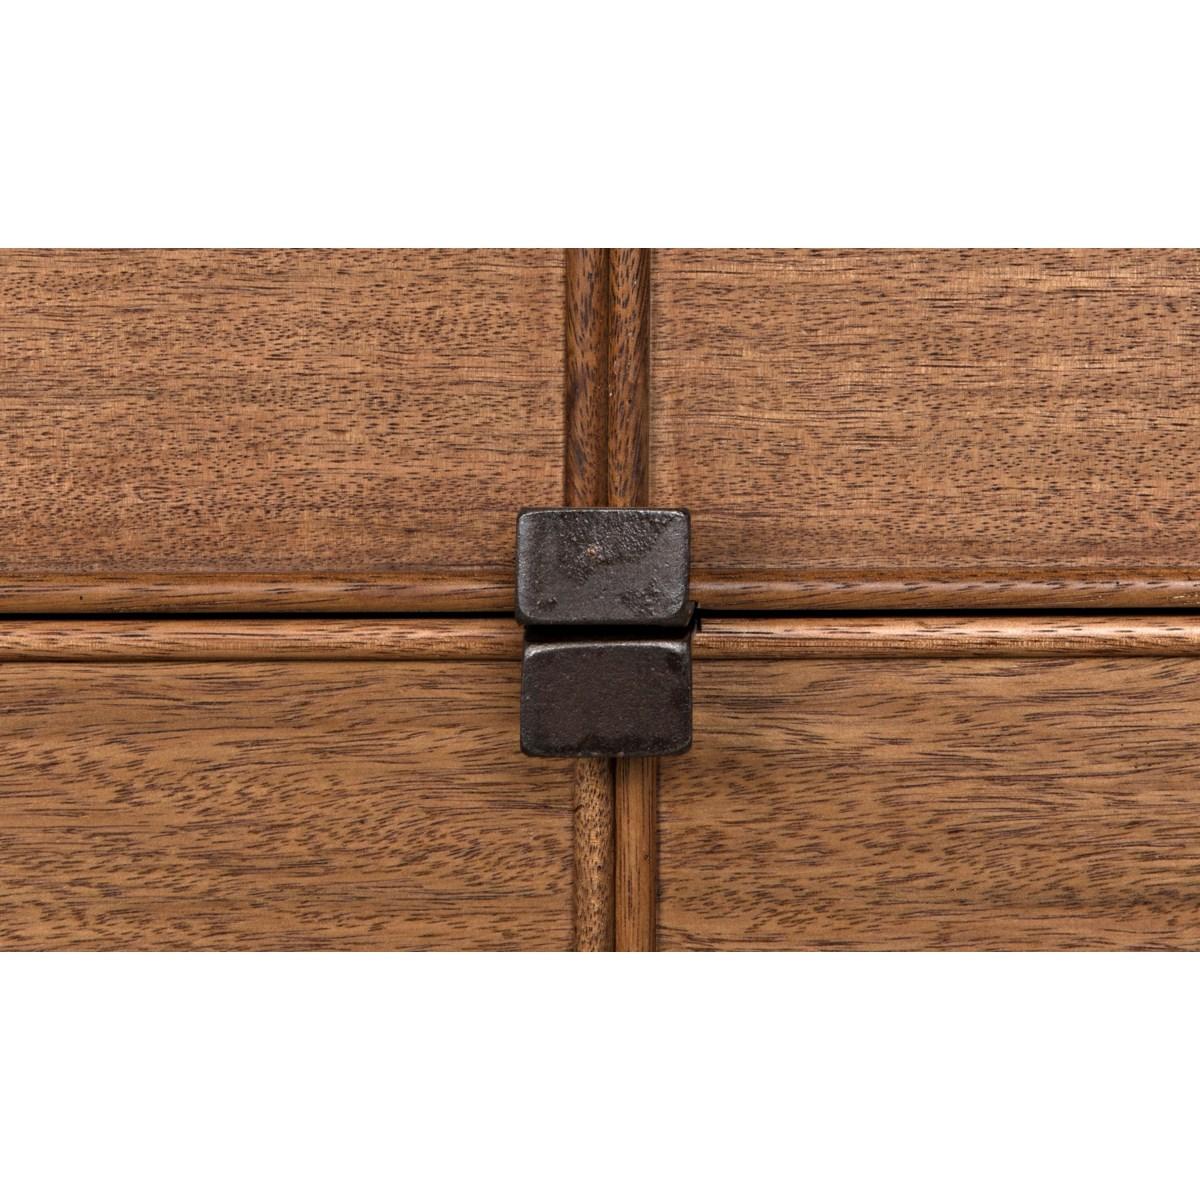 Bourgeois Sideboard, Walnut and Metal